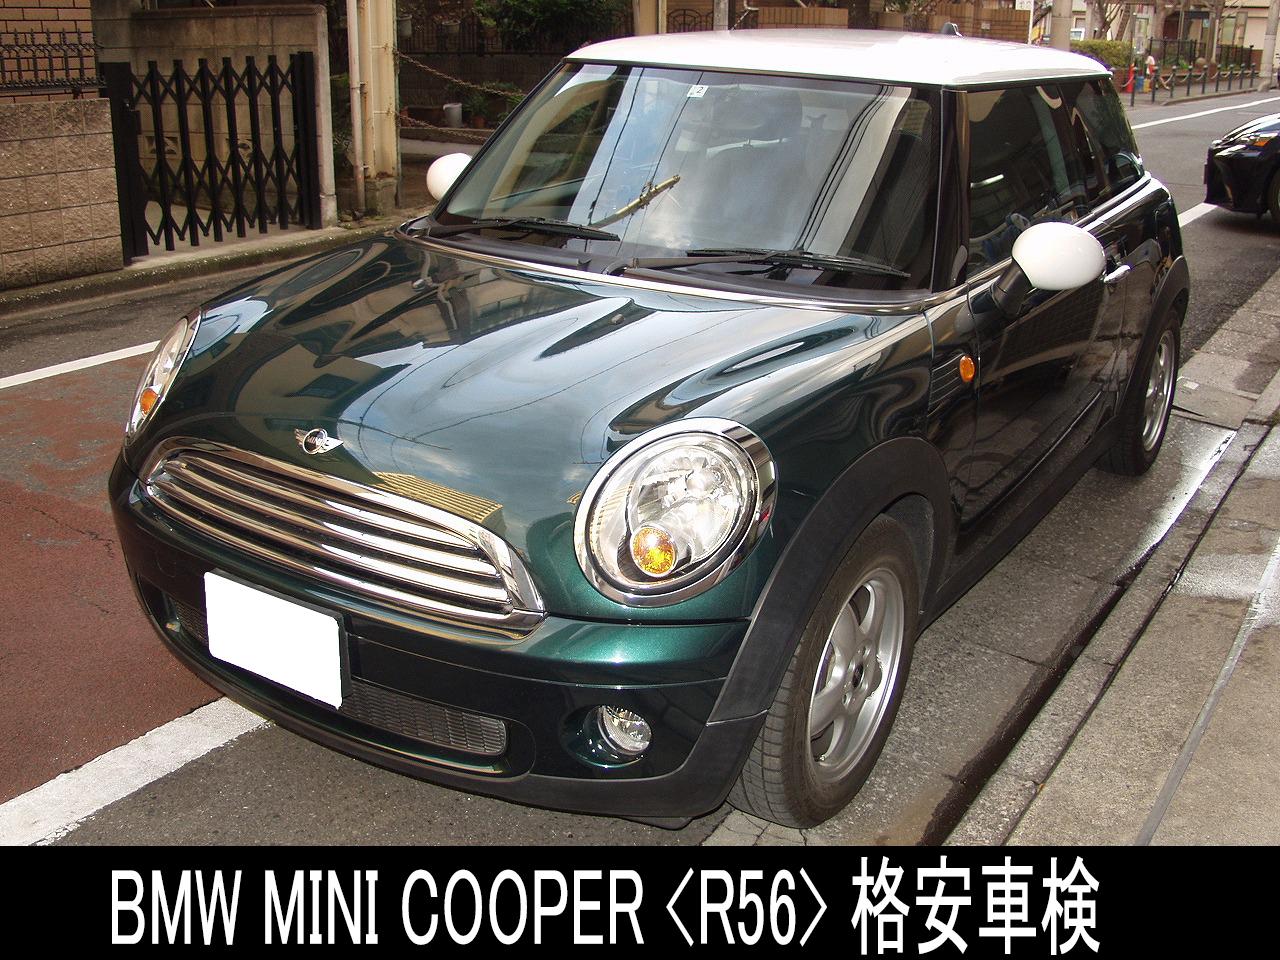 BMW MINI COOPER / ミニクーパー(R56)格安車検画像